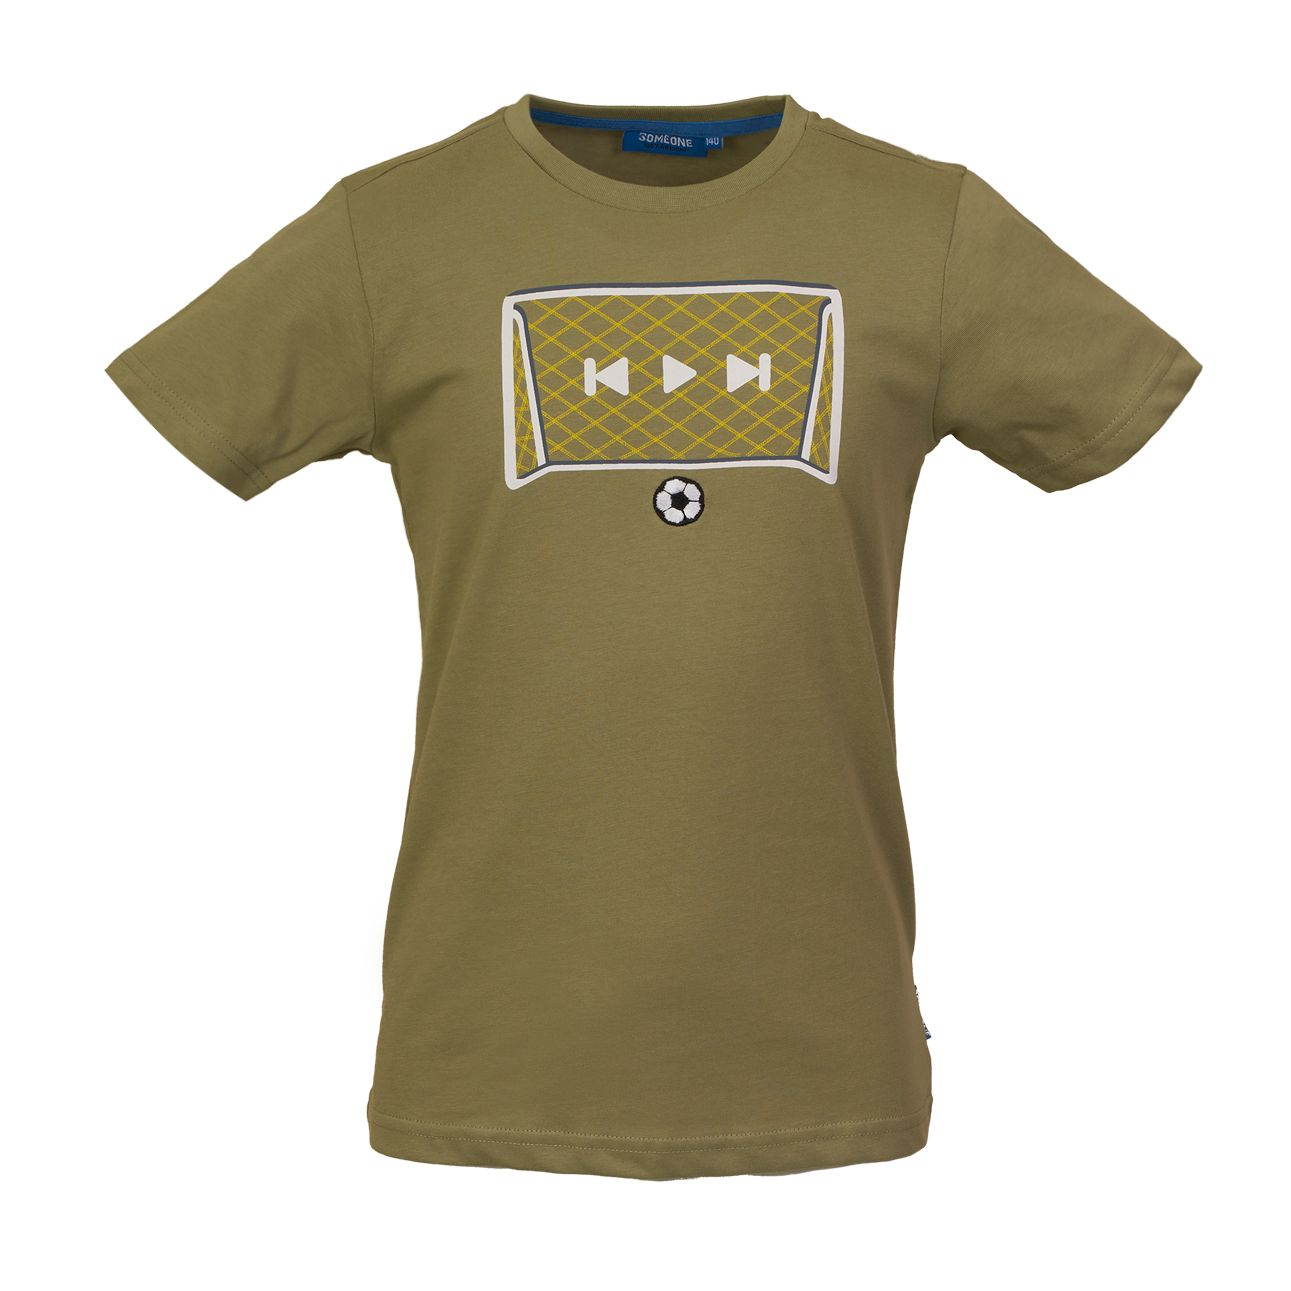 T-Shirt Tor 104 Khaki SOMEONE 100% Awesome